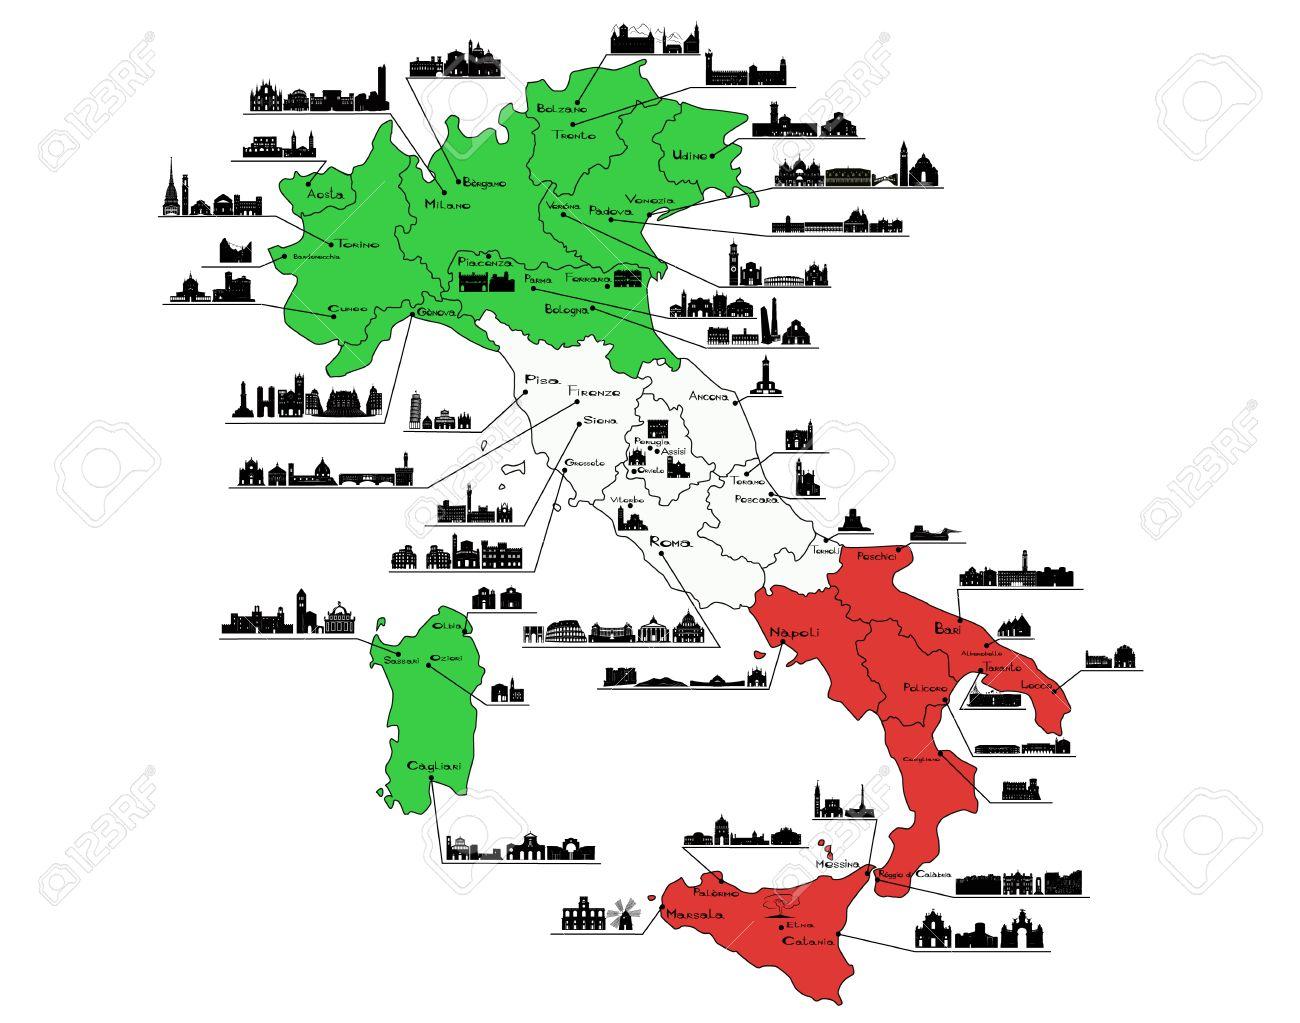 Bologna Cartina Italia.Napoli Italia Cartina